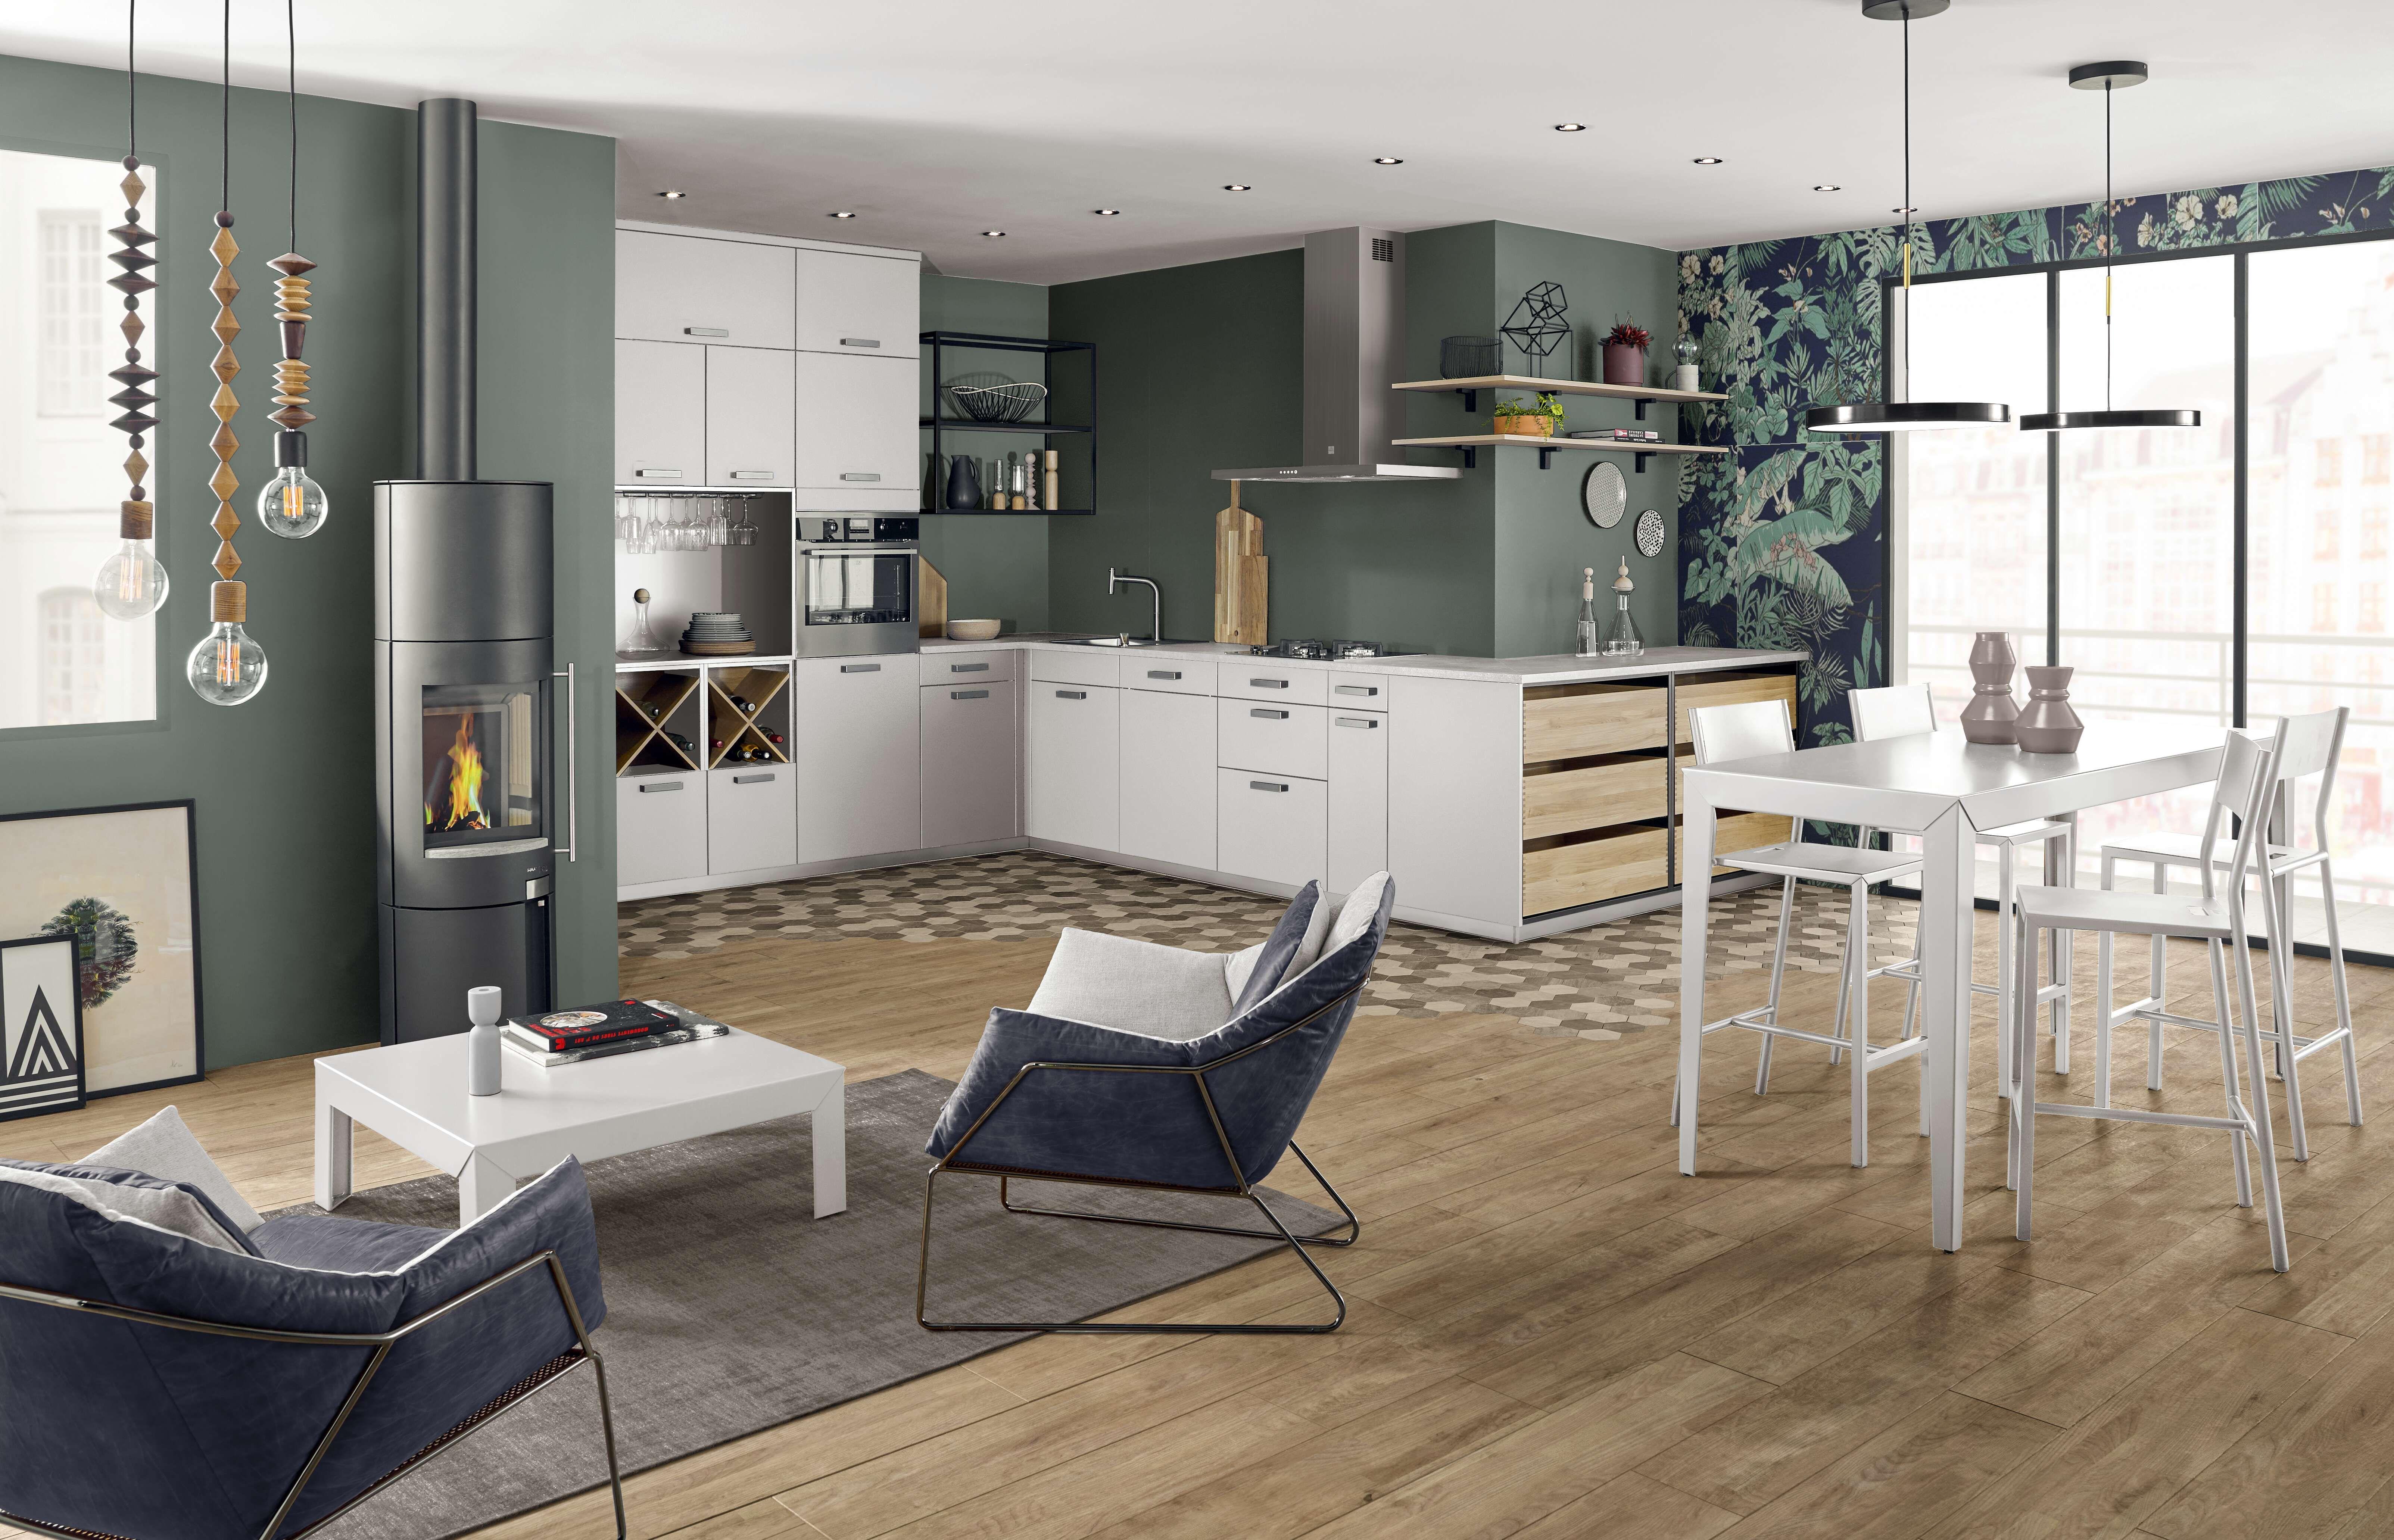 Ambiance Comptoir Meuble Rangement Cuisine Deco Appartement Mur Vert